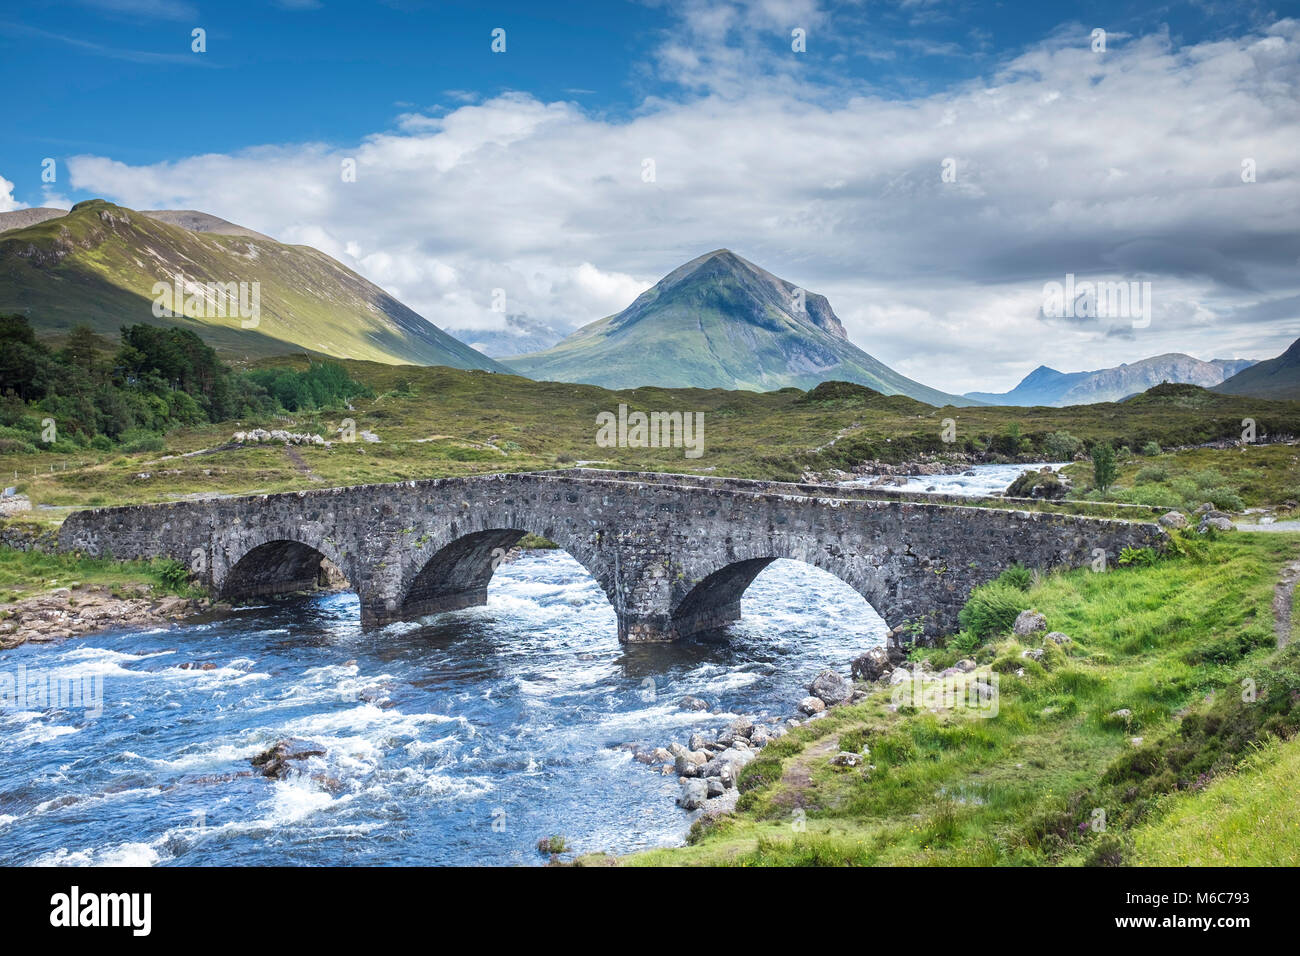 View of Sligachen Old Bridge over River Sligachan, Isle Of Skye Stock Photo